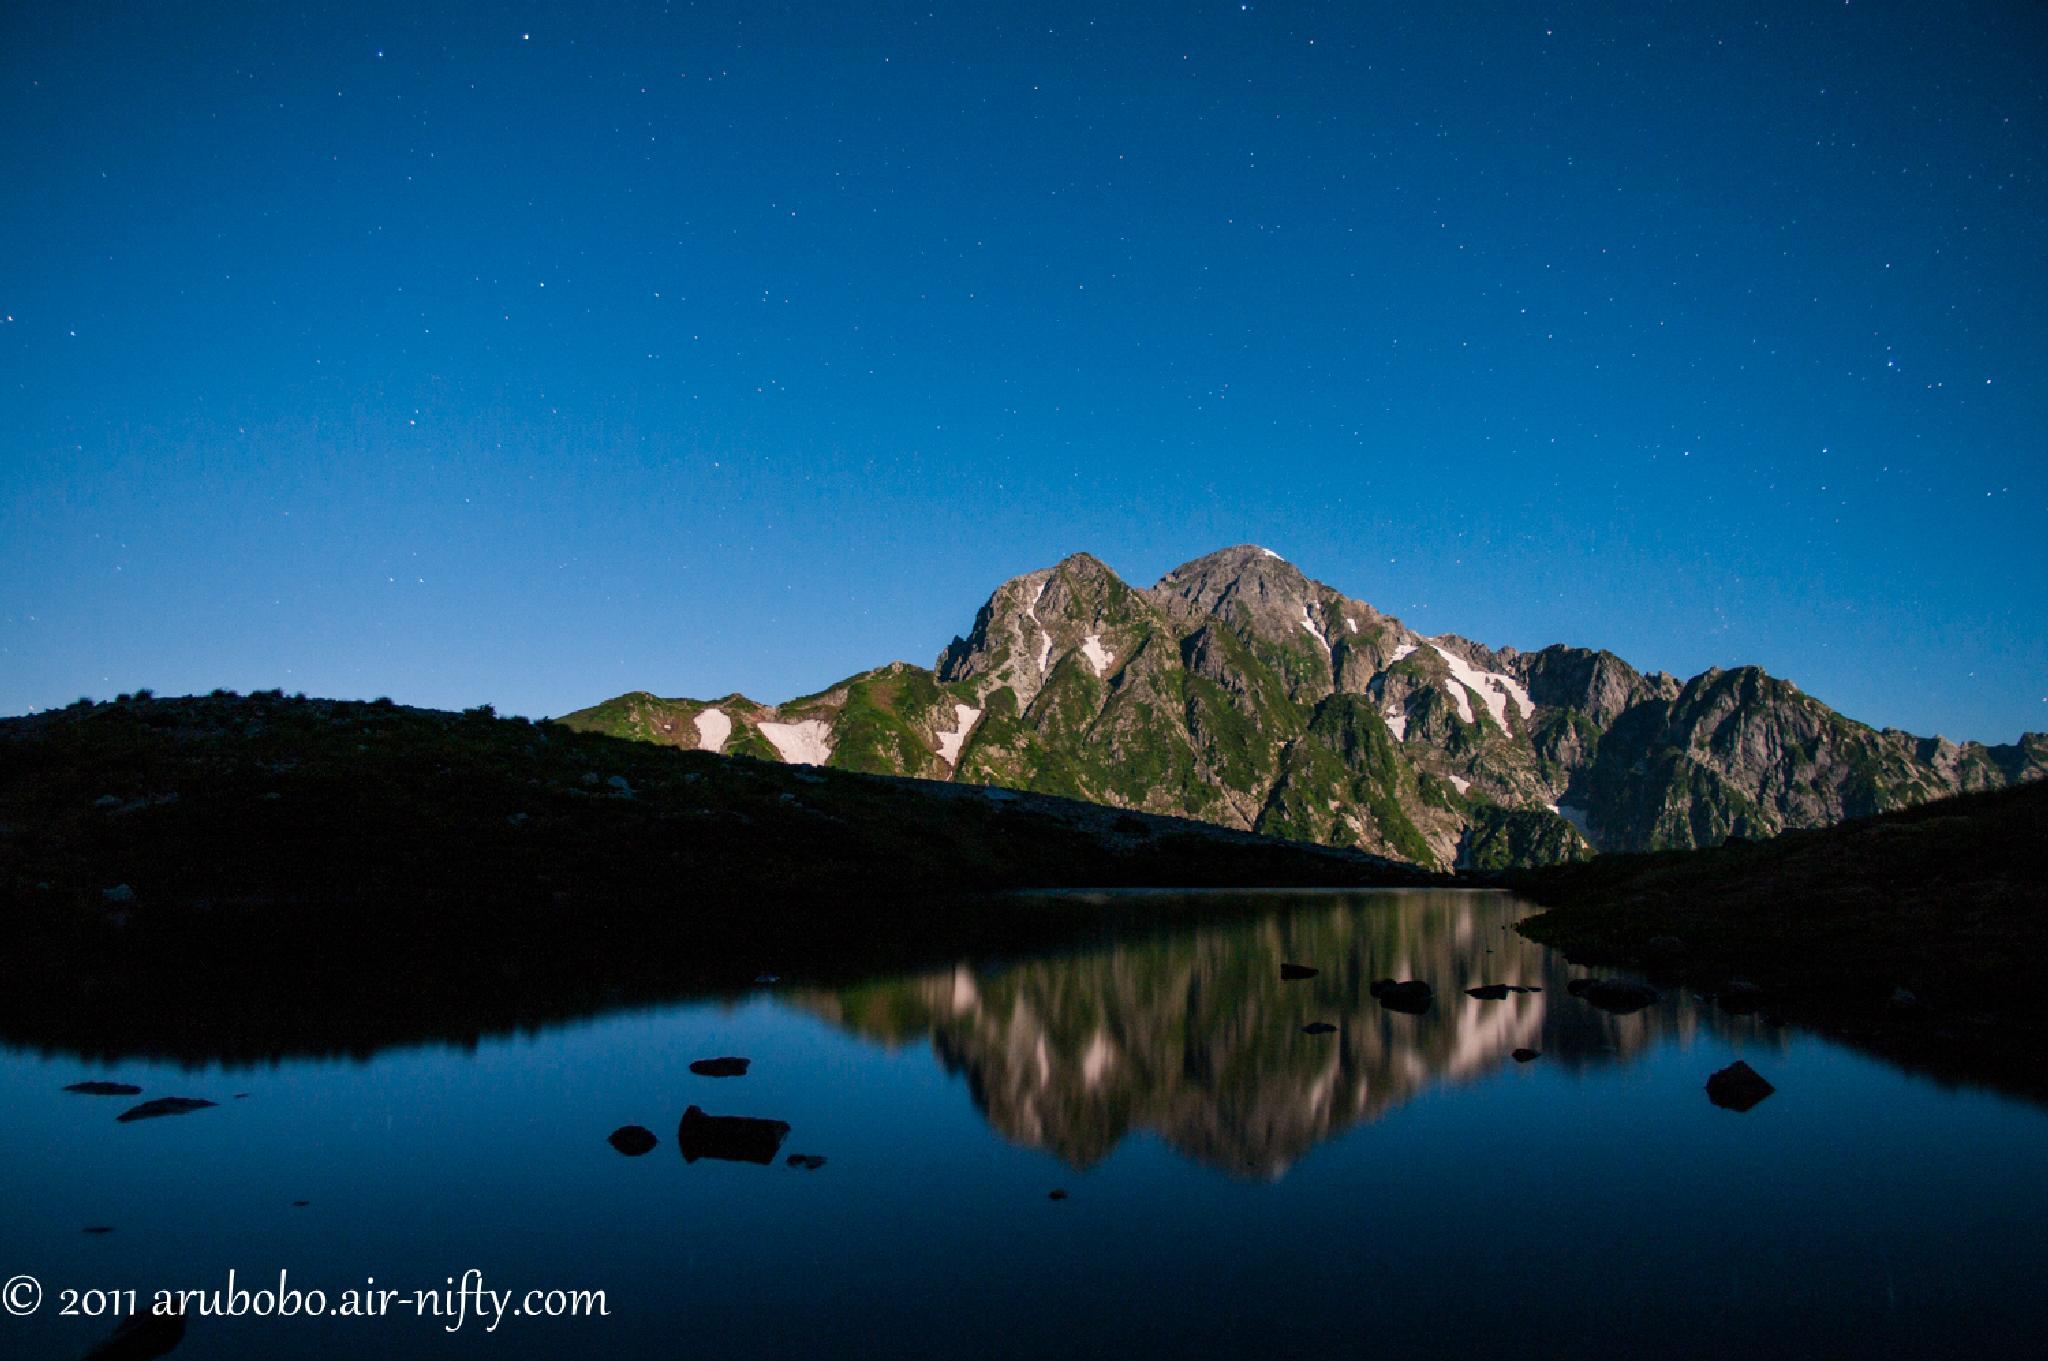 Moonlight Mt. Tsurugidake by katuhico.kumazaki